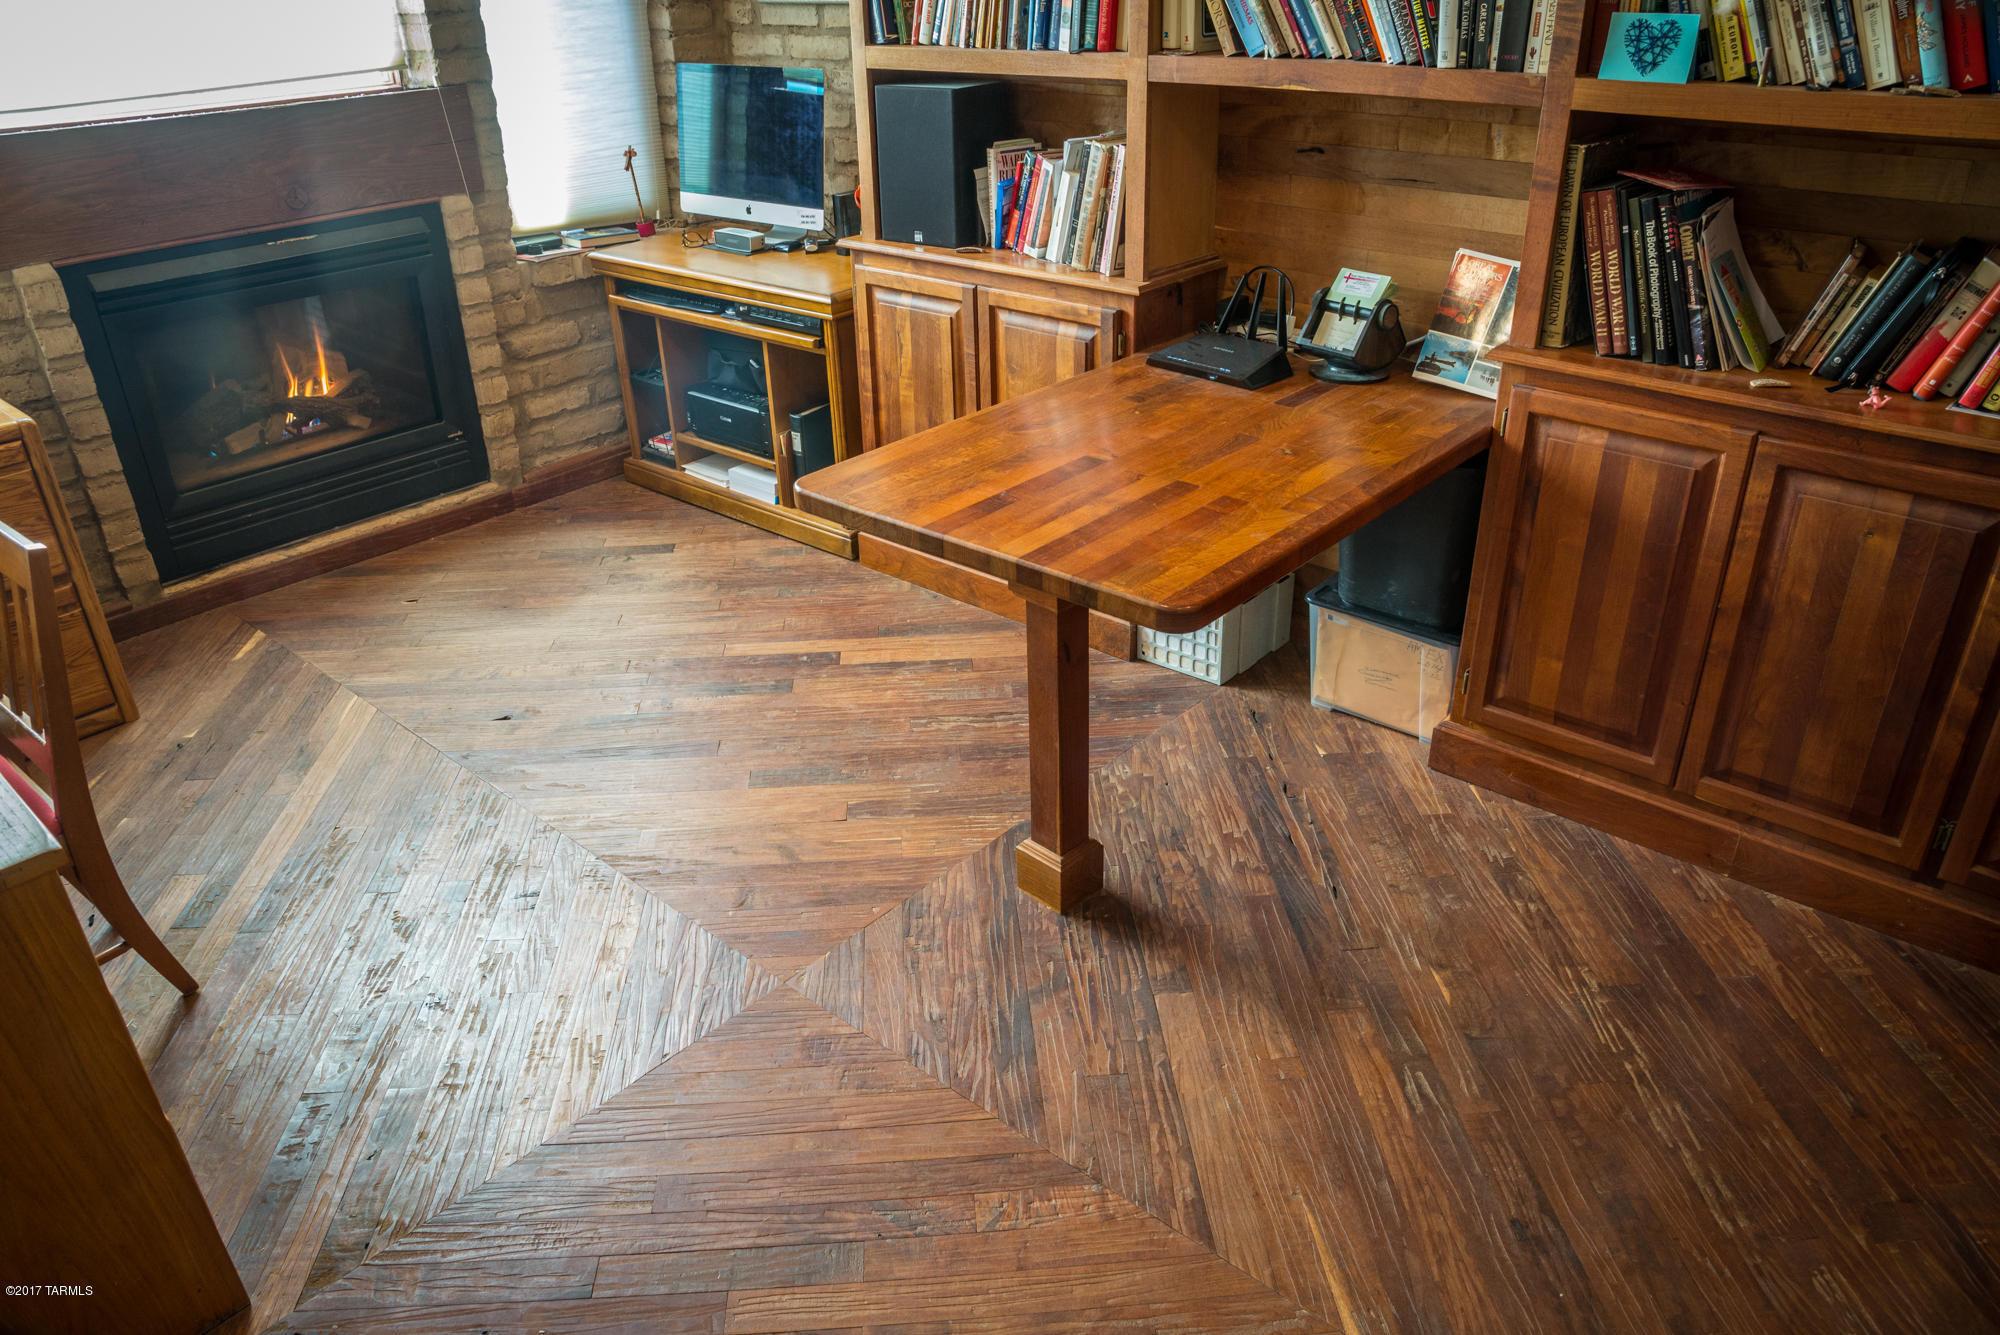 mesquite hardwood flooring price of 12 foothills court sonoita property listing mlsa 21714663 inside custom mesquite flooring and shelving